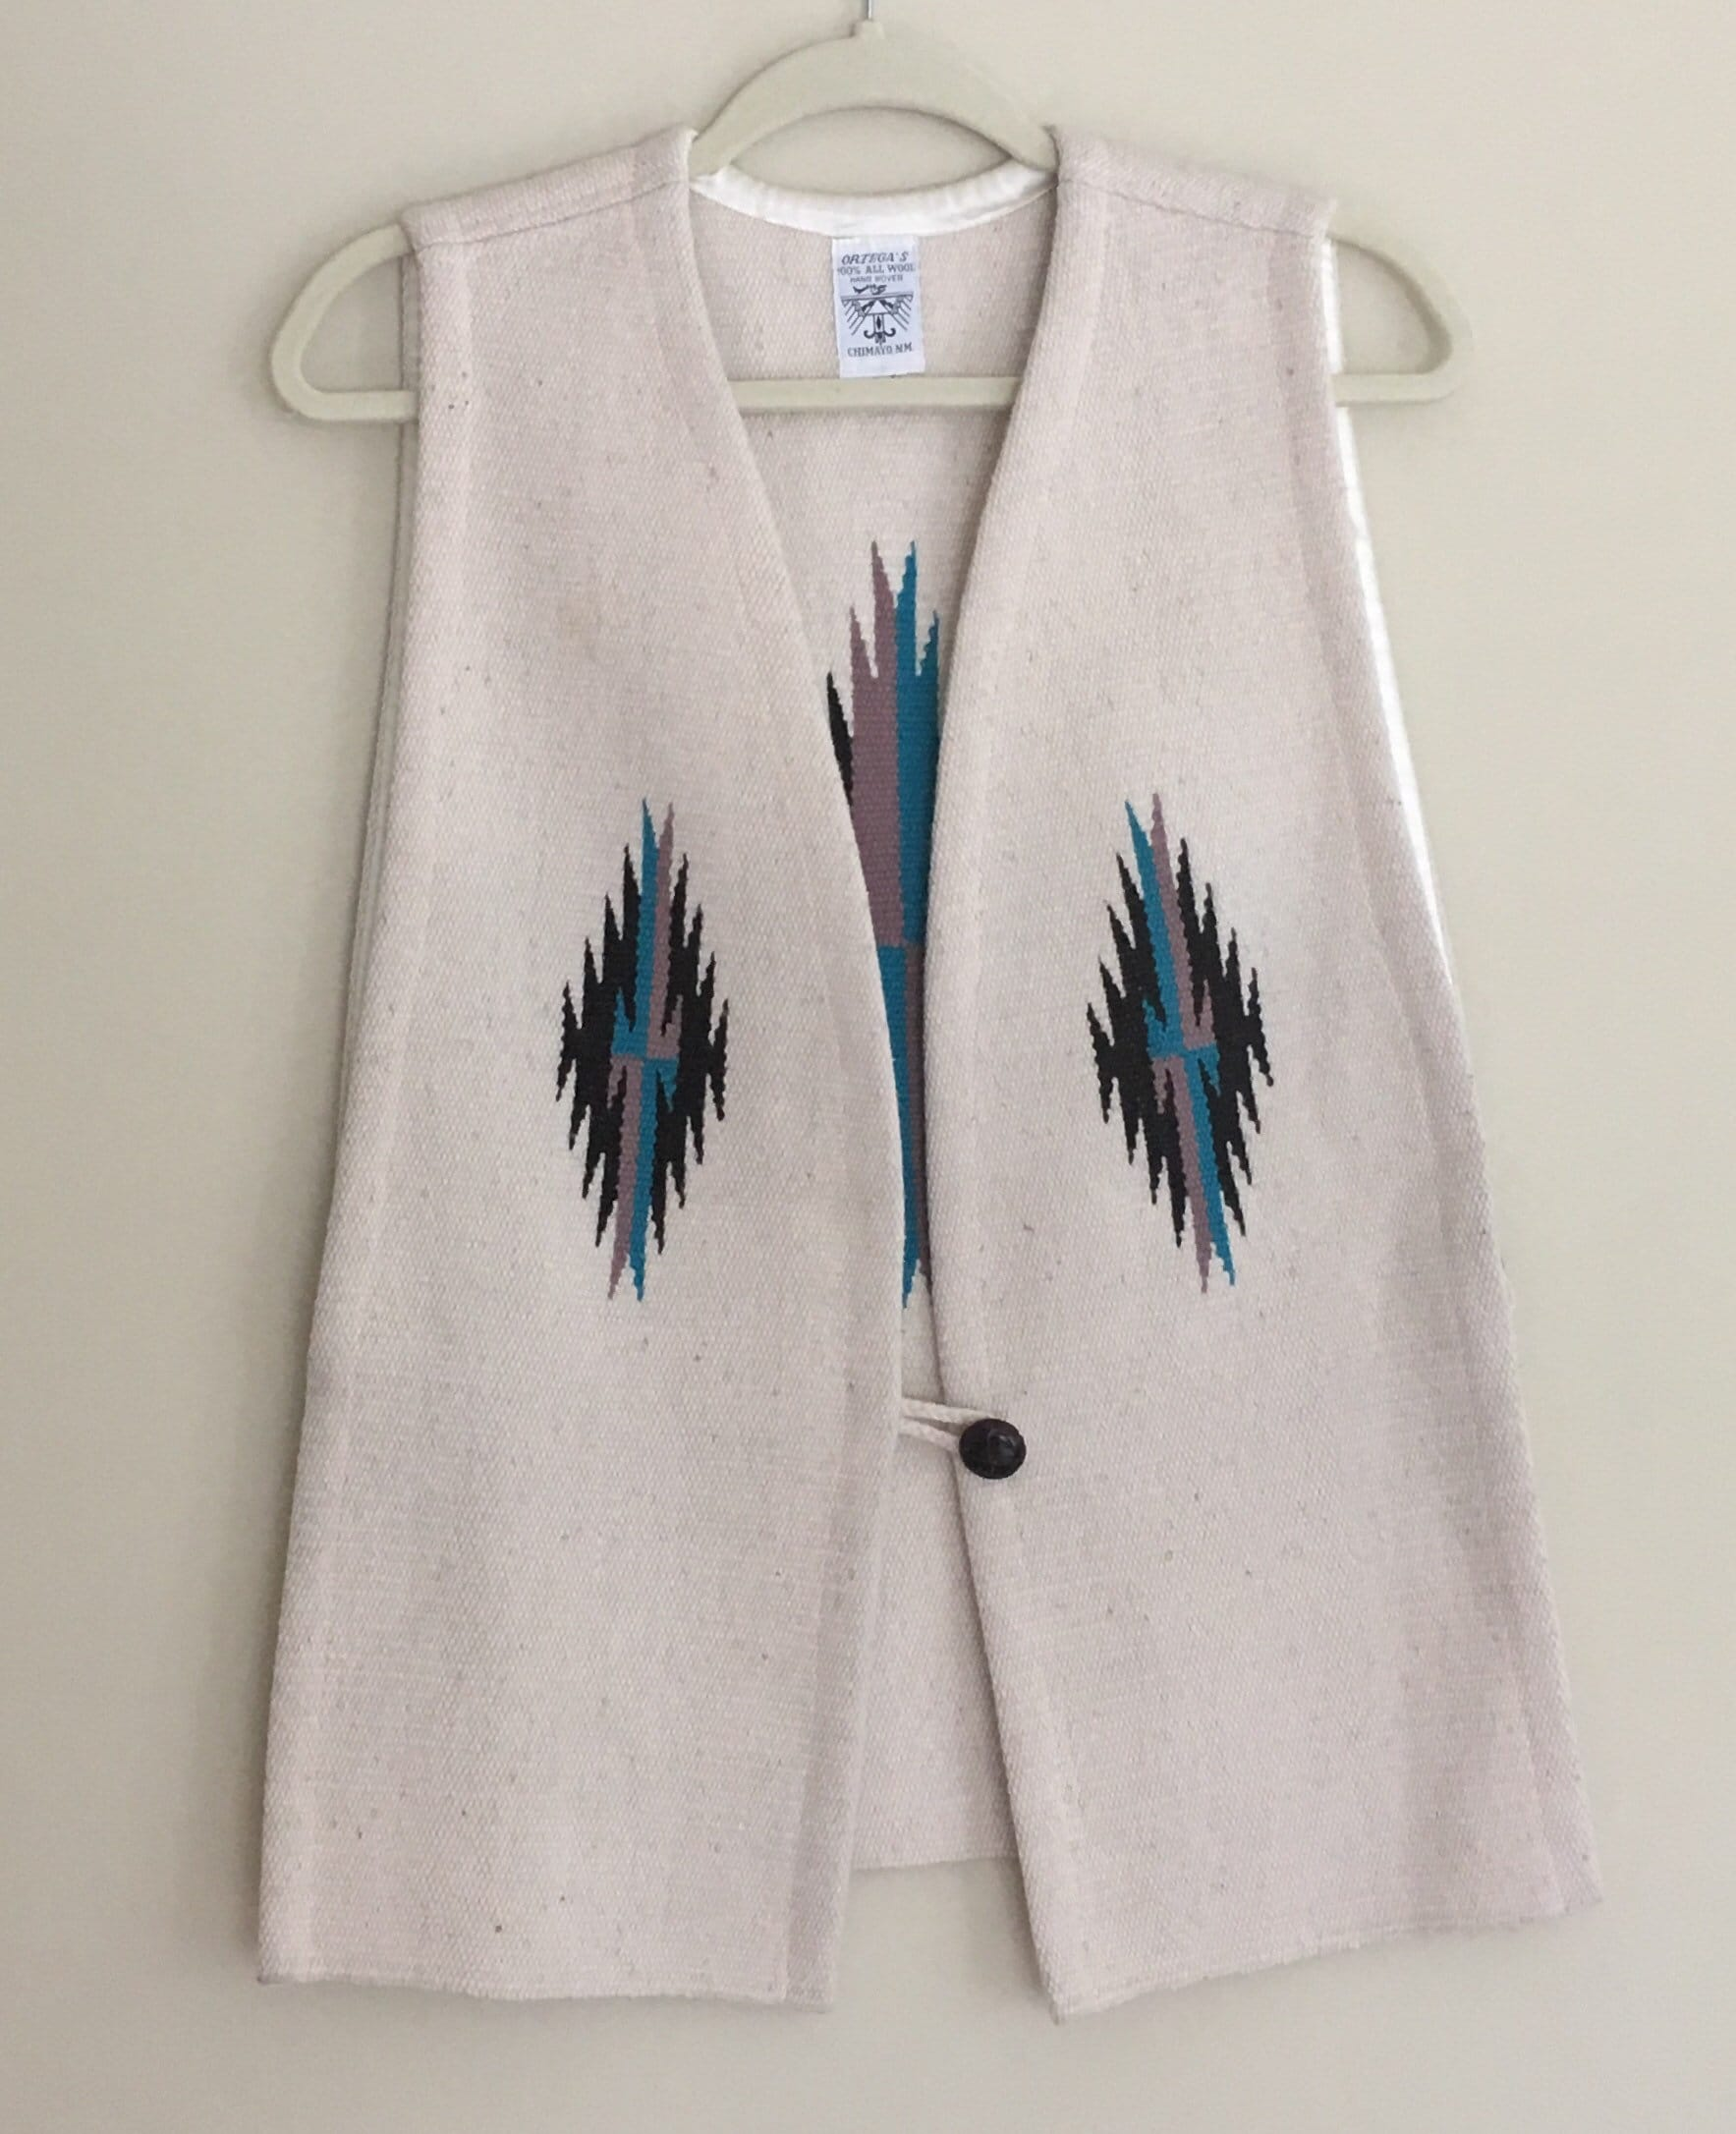 Woven S Hand Sweater Vest Chimayo Turquoise Cream Mexico Vintage Southwest New Size Ortega's Wool Coat 9E2DHI